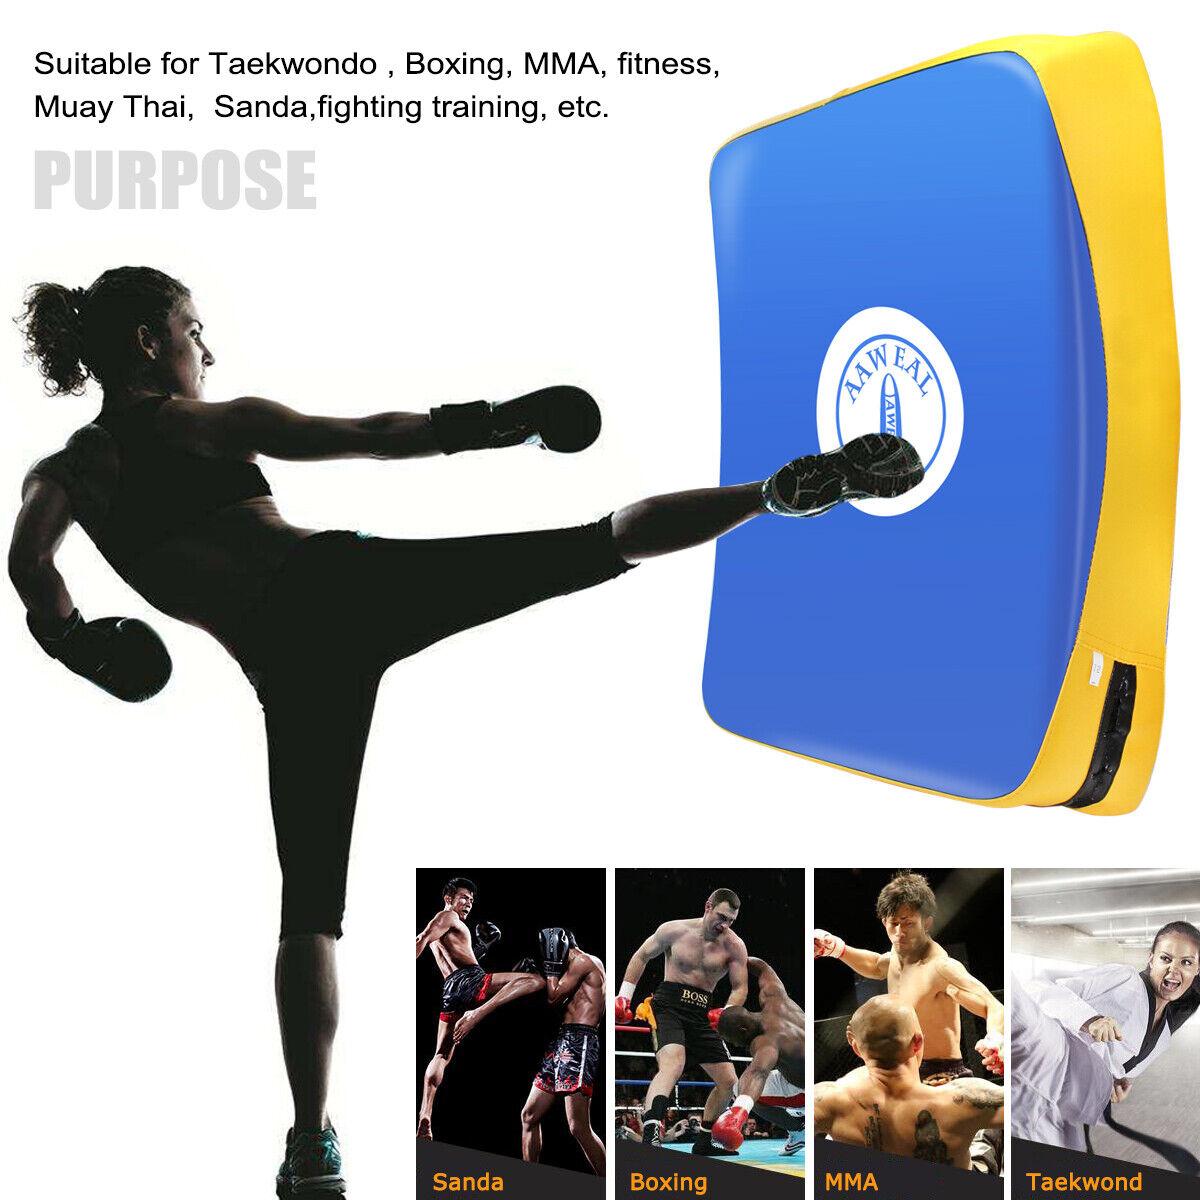 Muay Thai kick dojo Wuudi Hand pads 1 pair boxing training target focus impact pads boxing pads training pad kickboxing training hand pads for karate sparring MMA martial arts